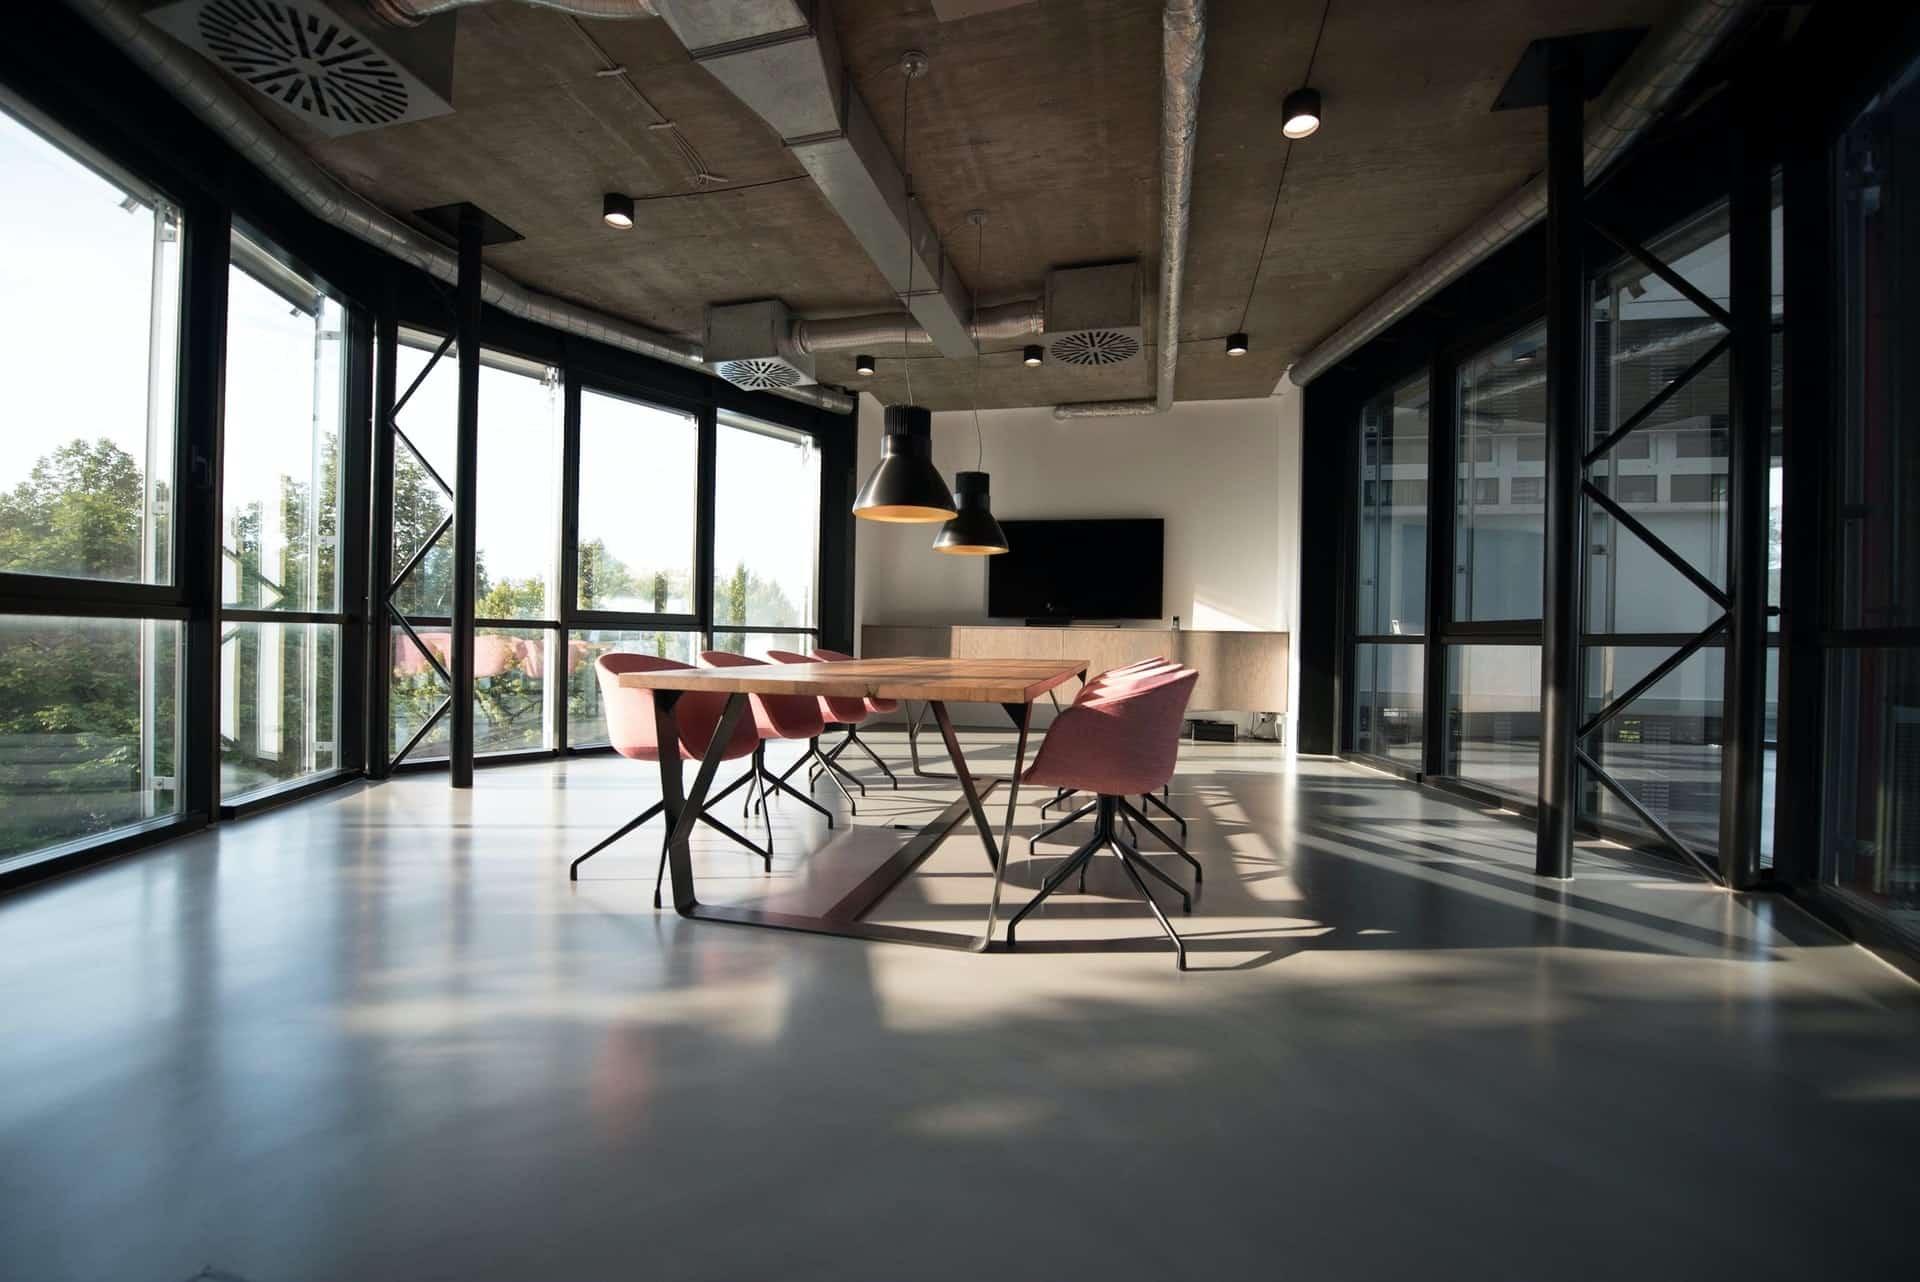 Meeting Room Booking Software Header Image